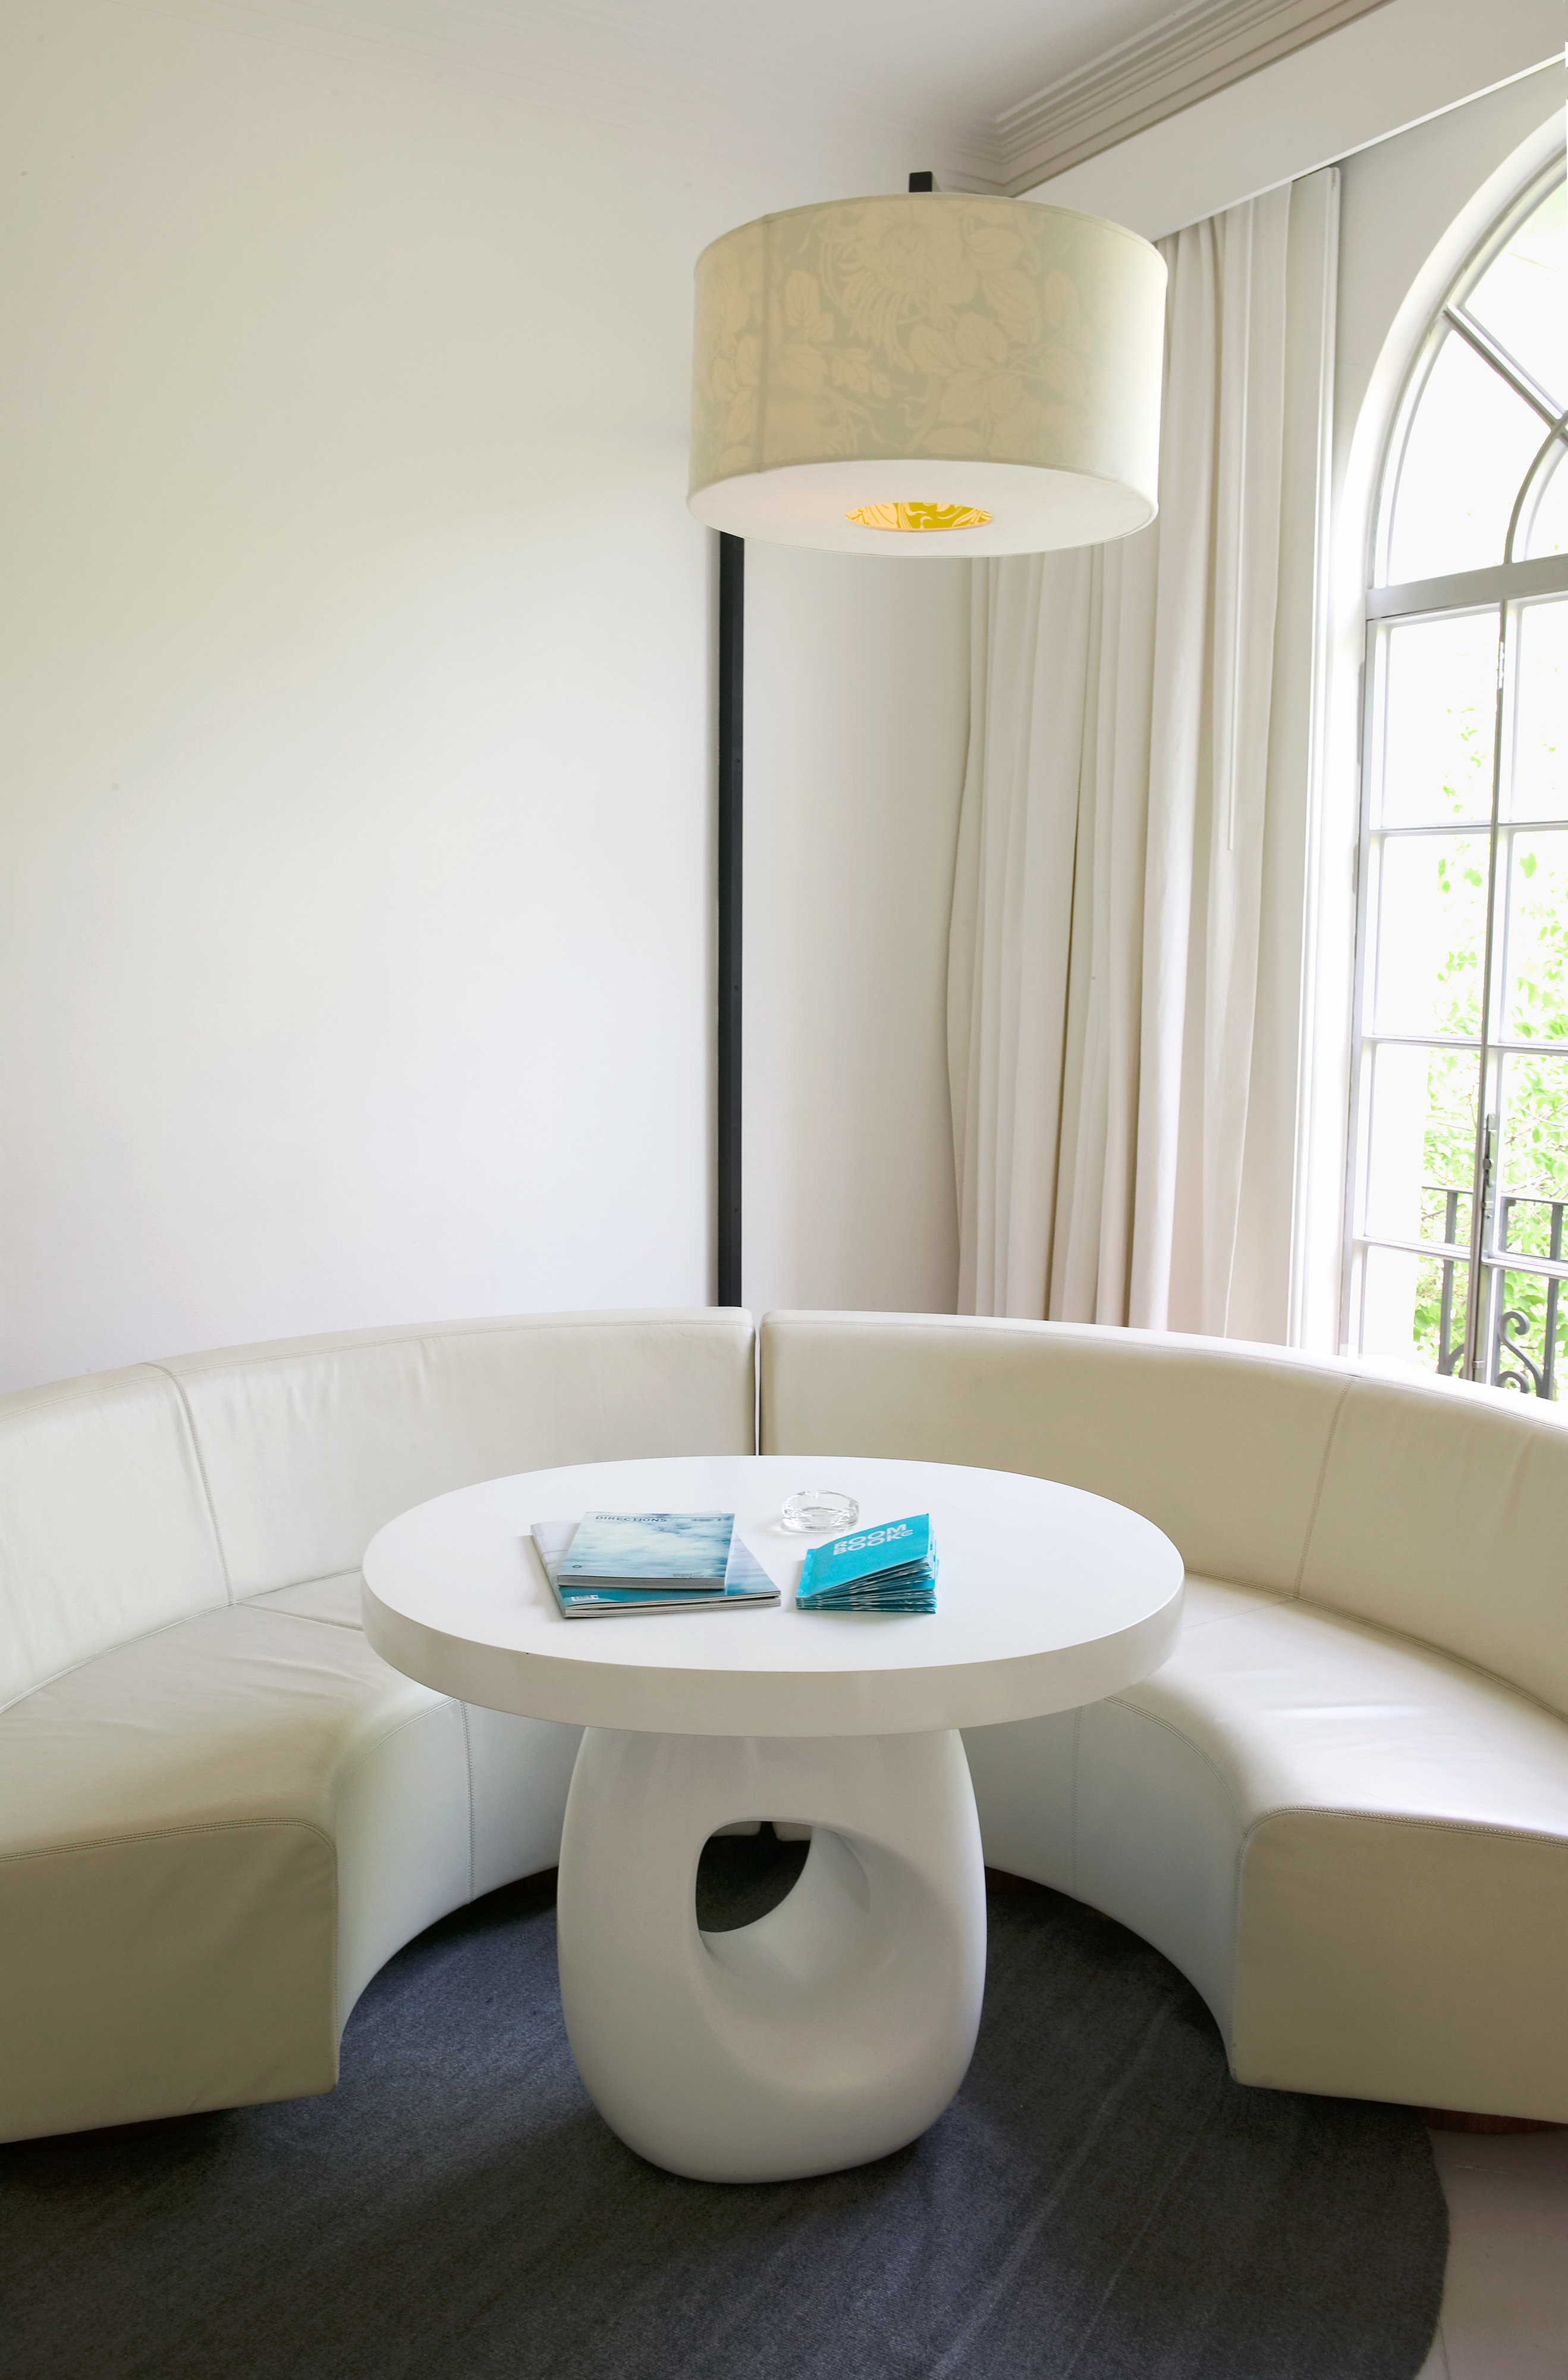 Hip Lounge Modern lighting living room bidet plumbing fixture flooring